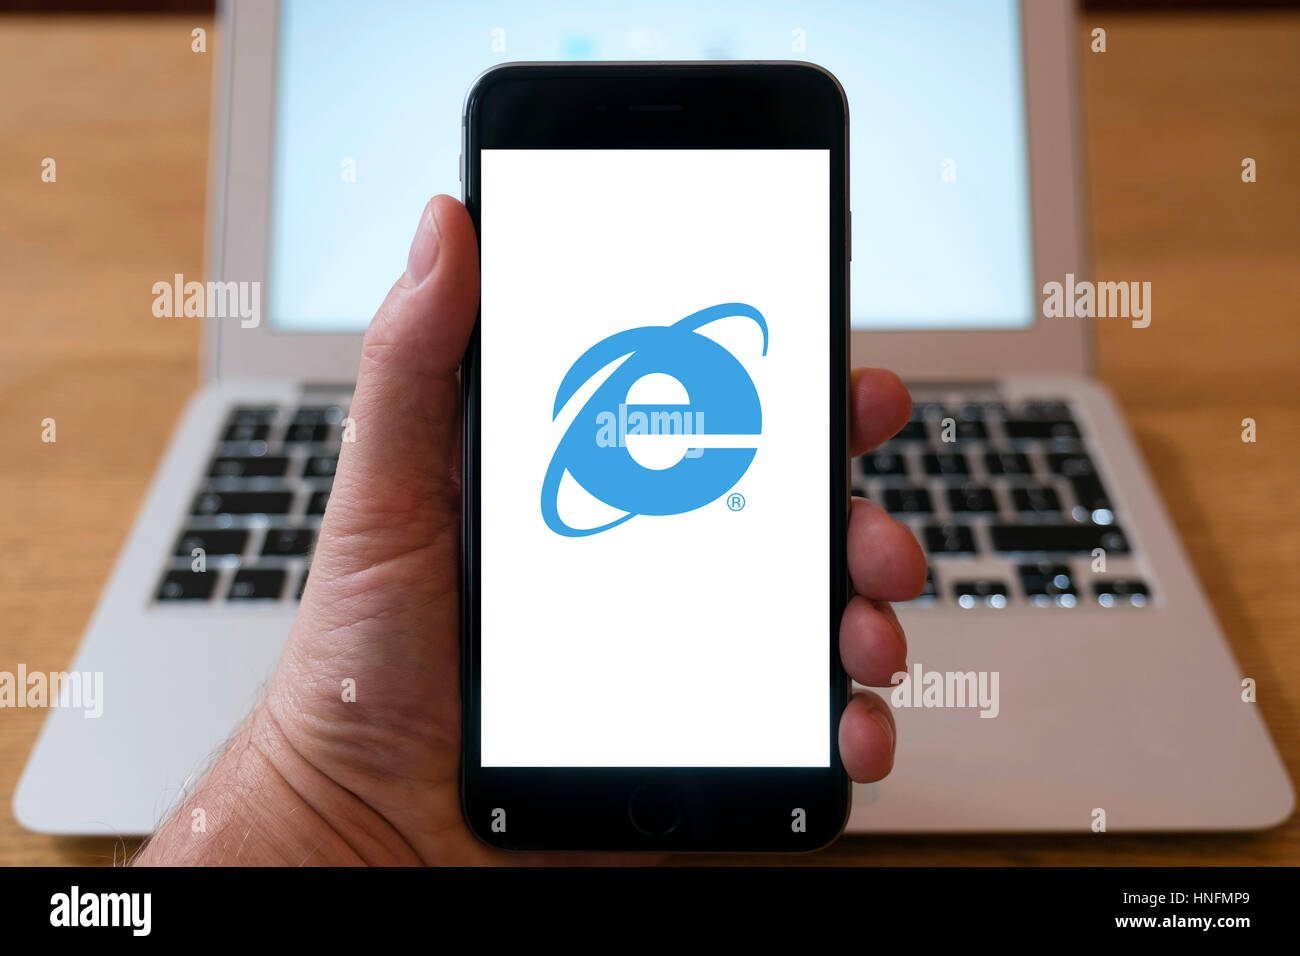 Internet Explorer web browser logo on smart phone - Stock Image